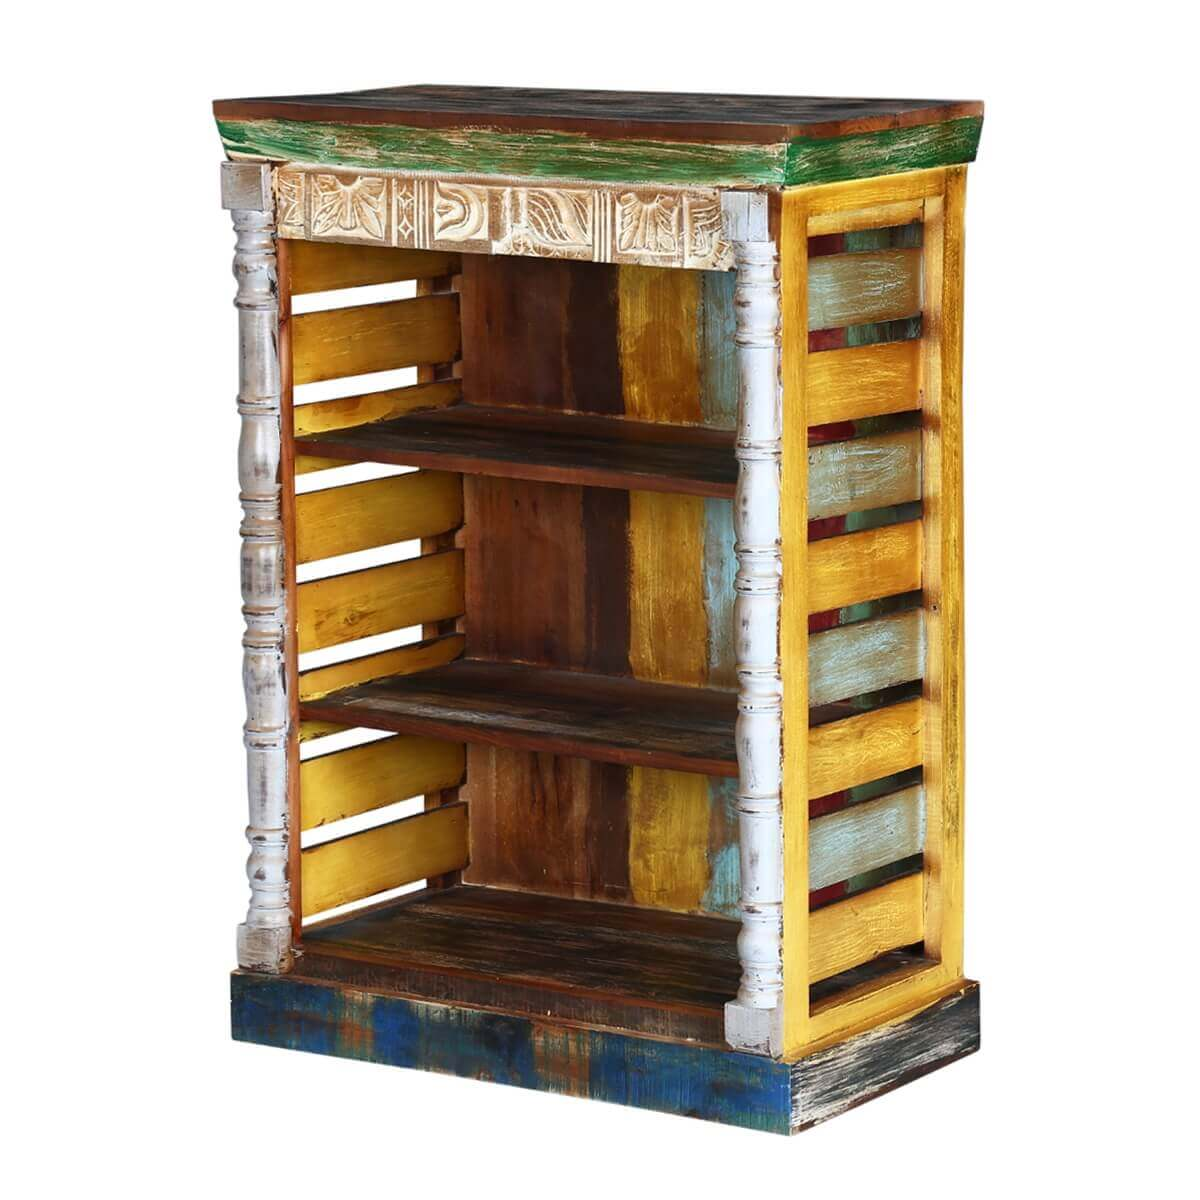 Rustic Art Multi Color Reclaimed Wood Book Shelf